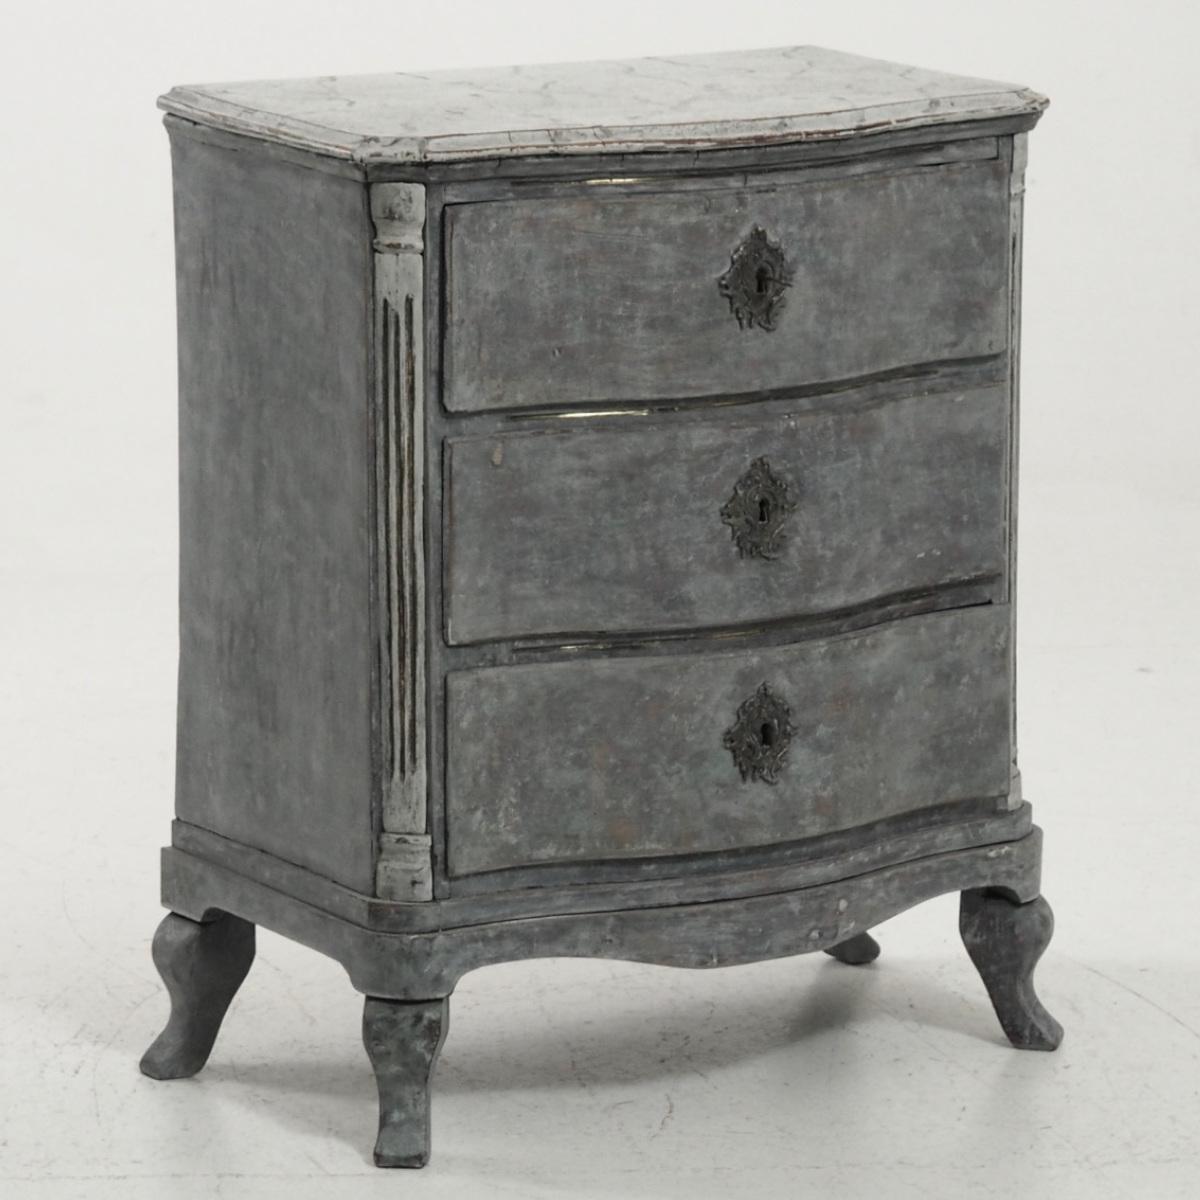 Scandinavian Rococo chest, 1740 - € 1.800